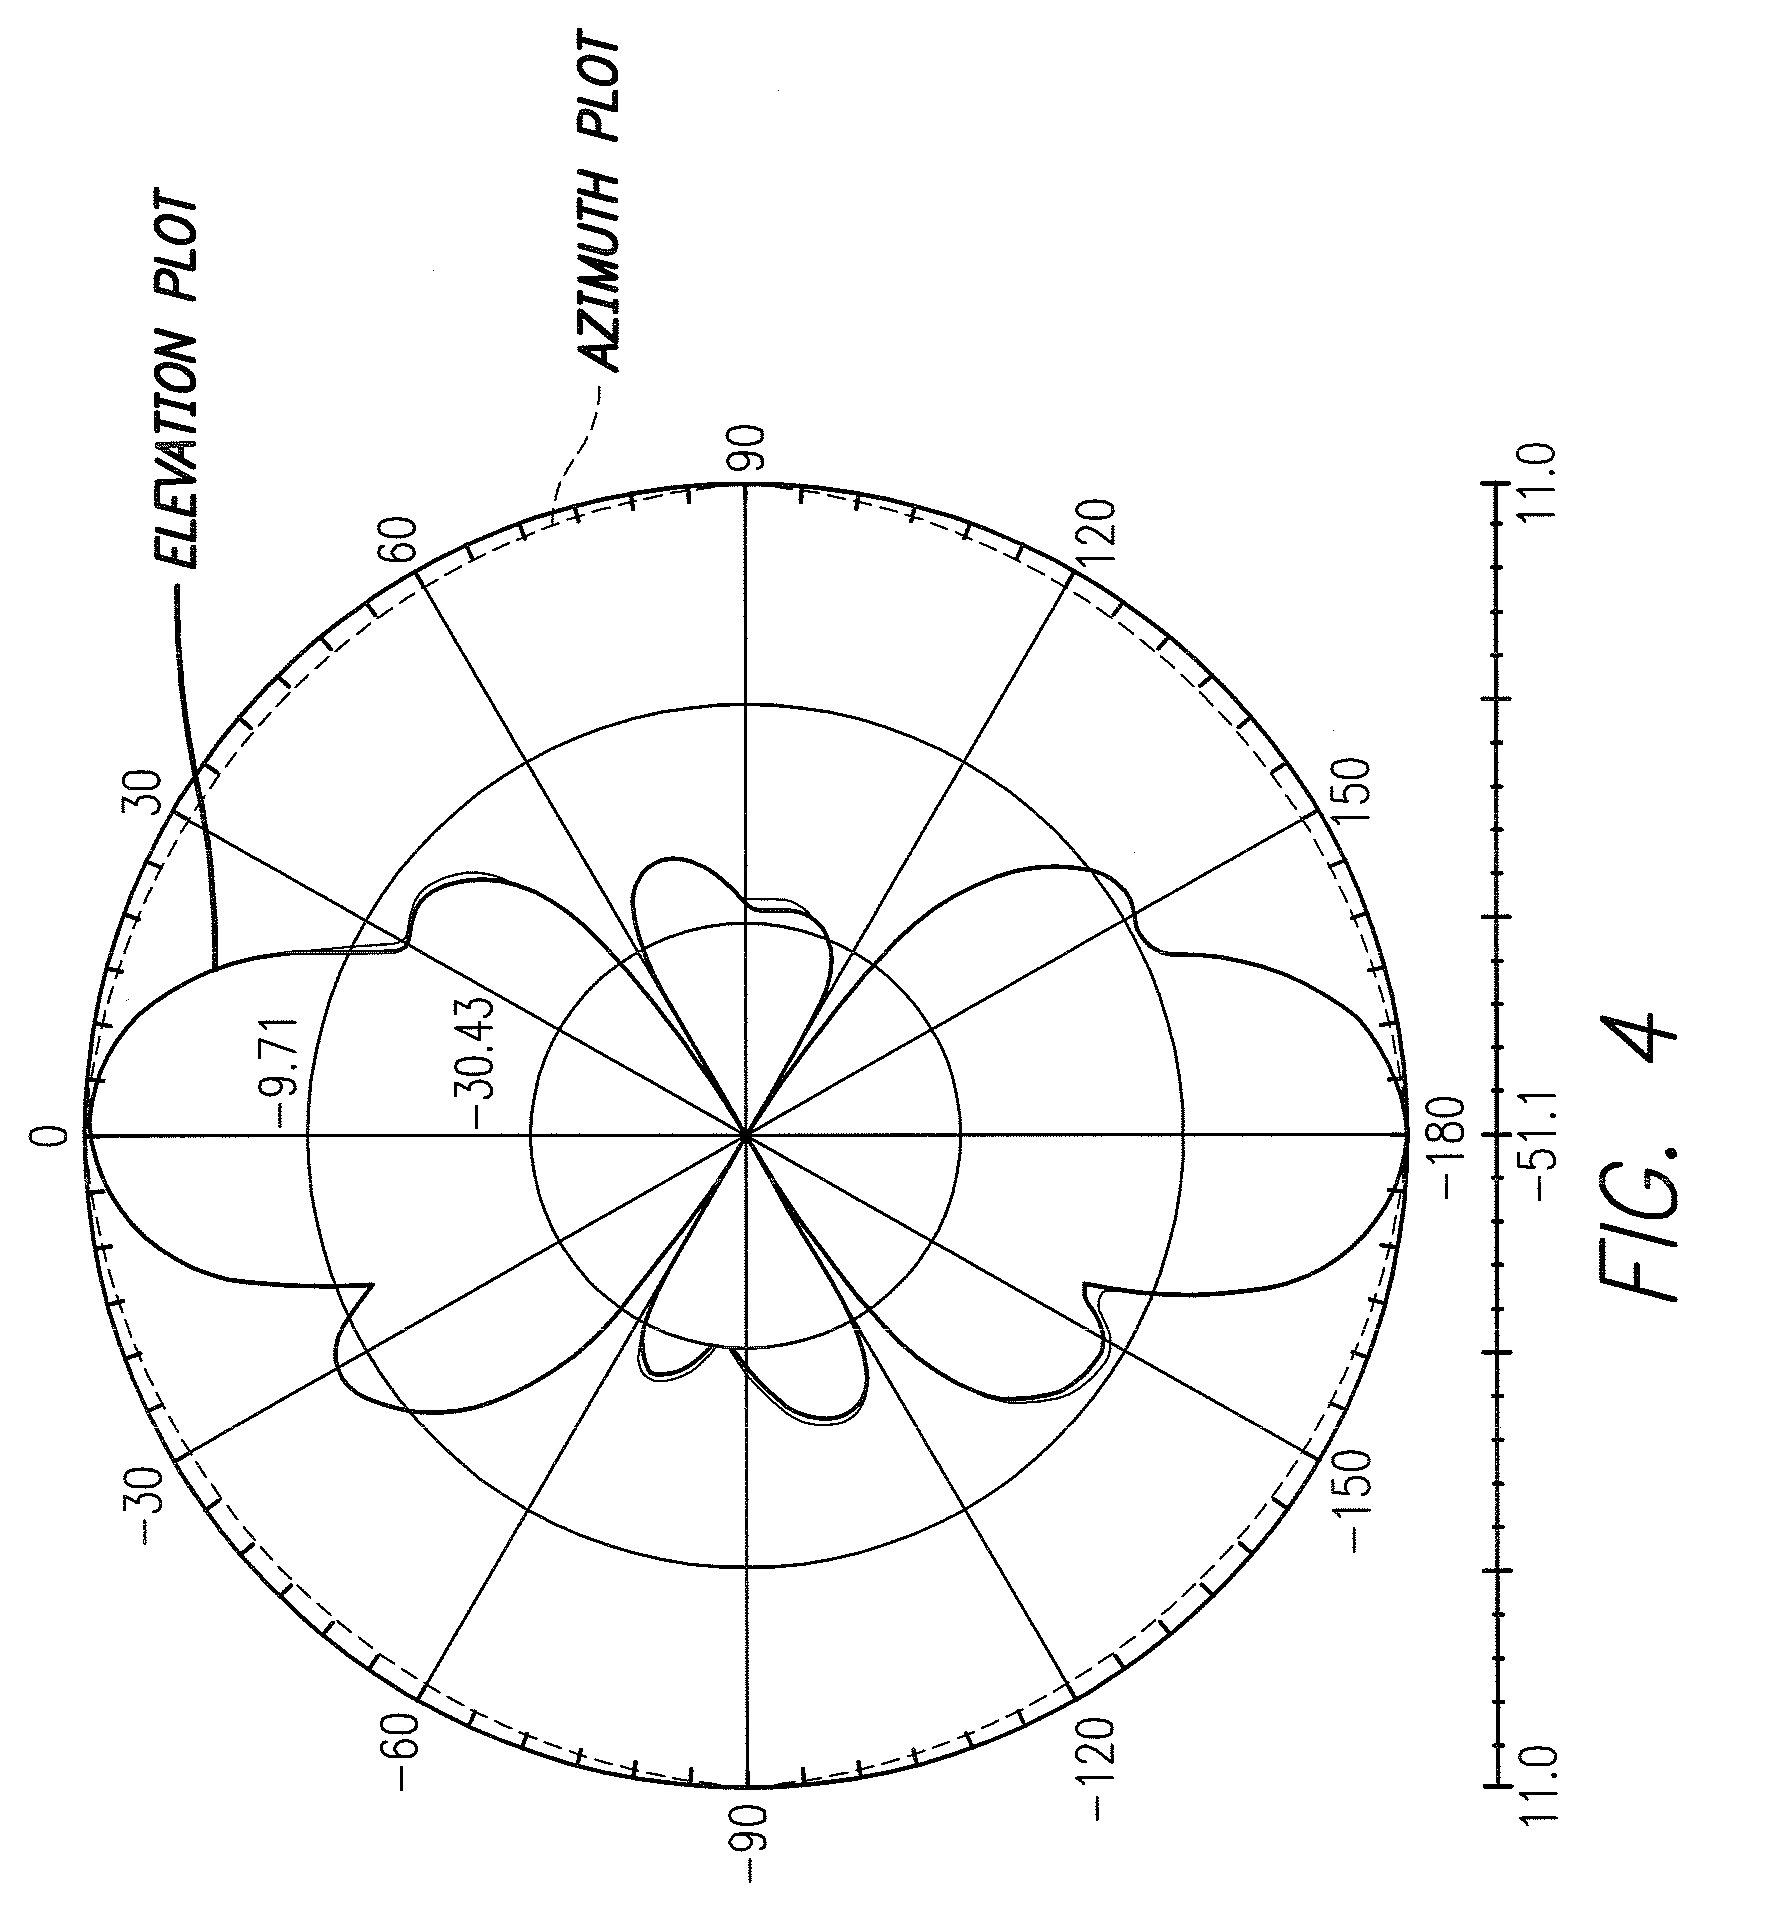 patent us7986280 - multi-element broadband omni-directional antenna array